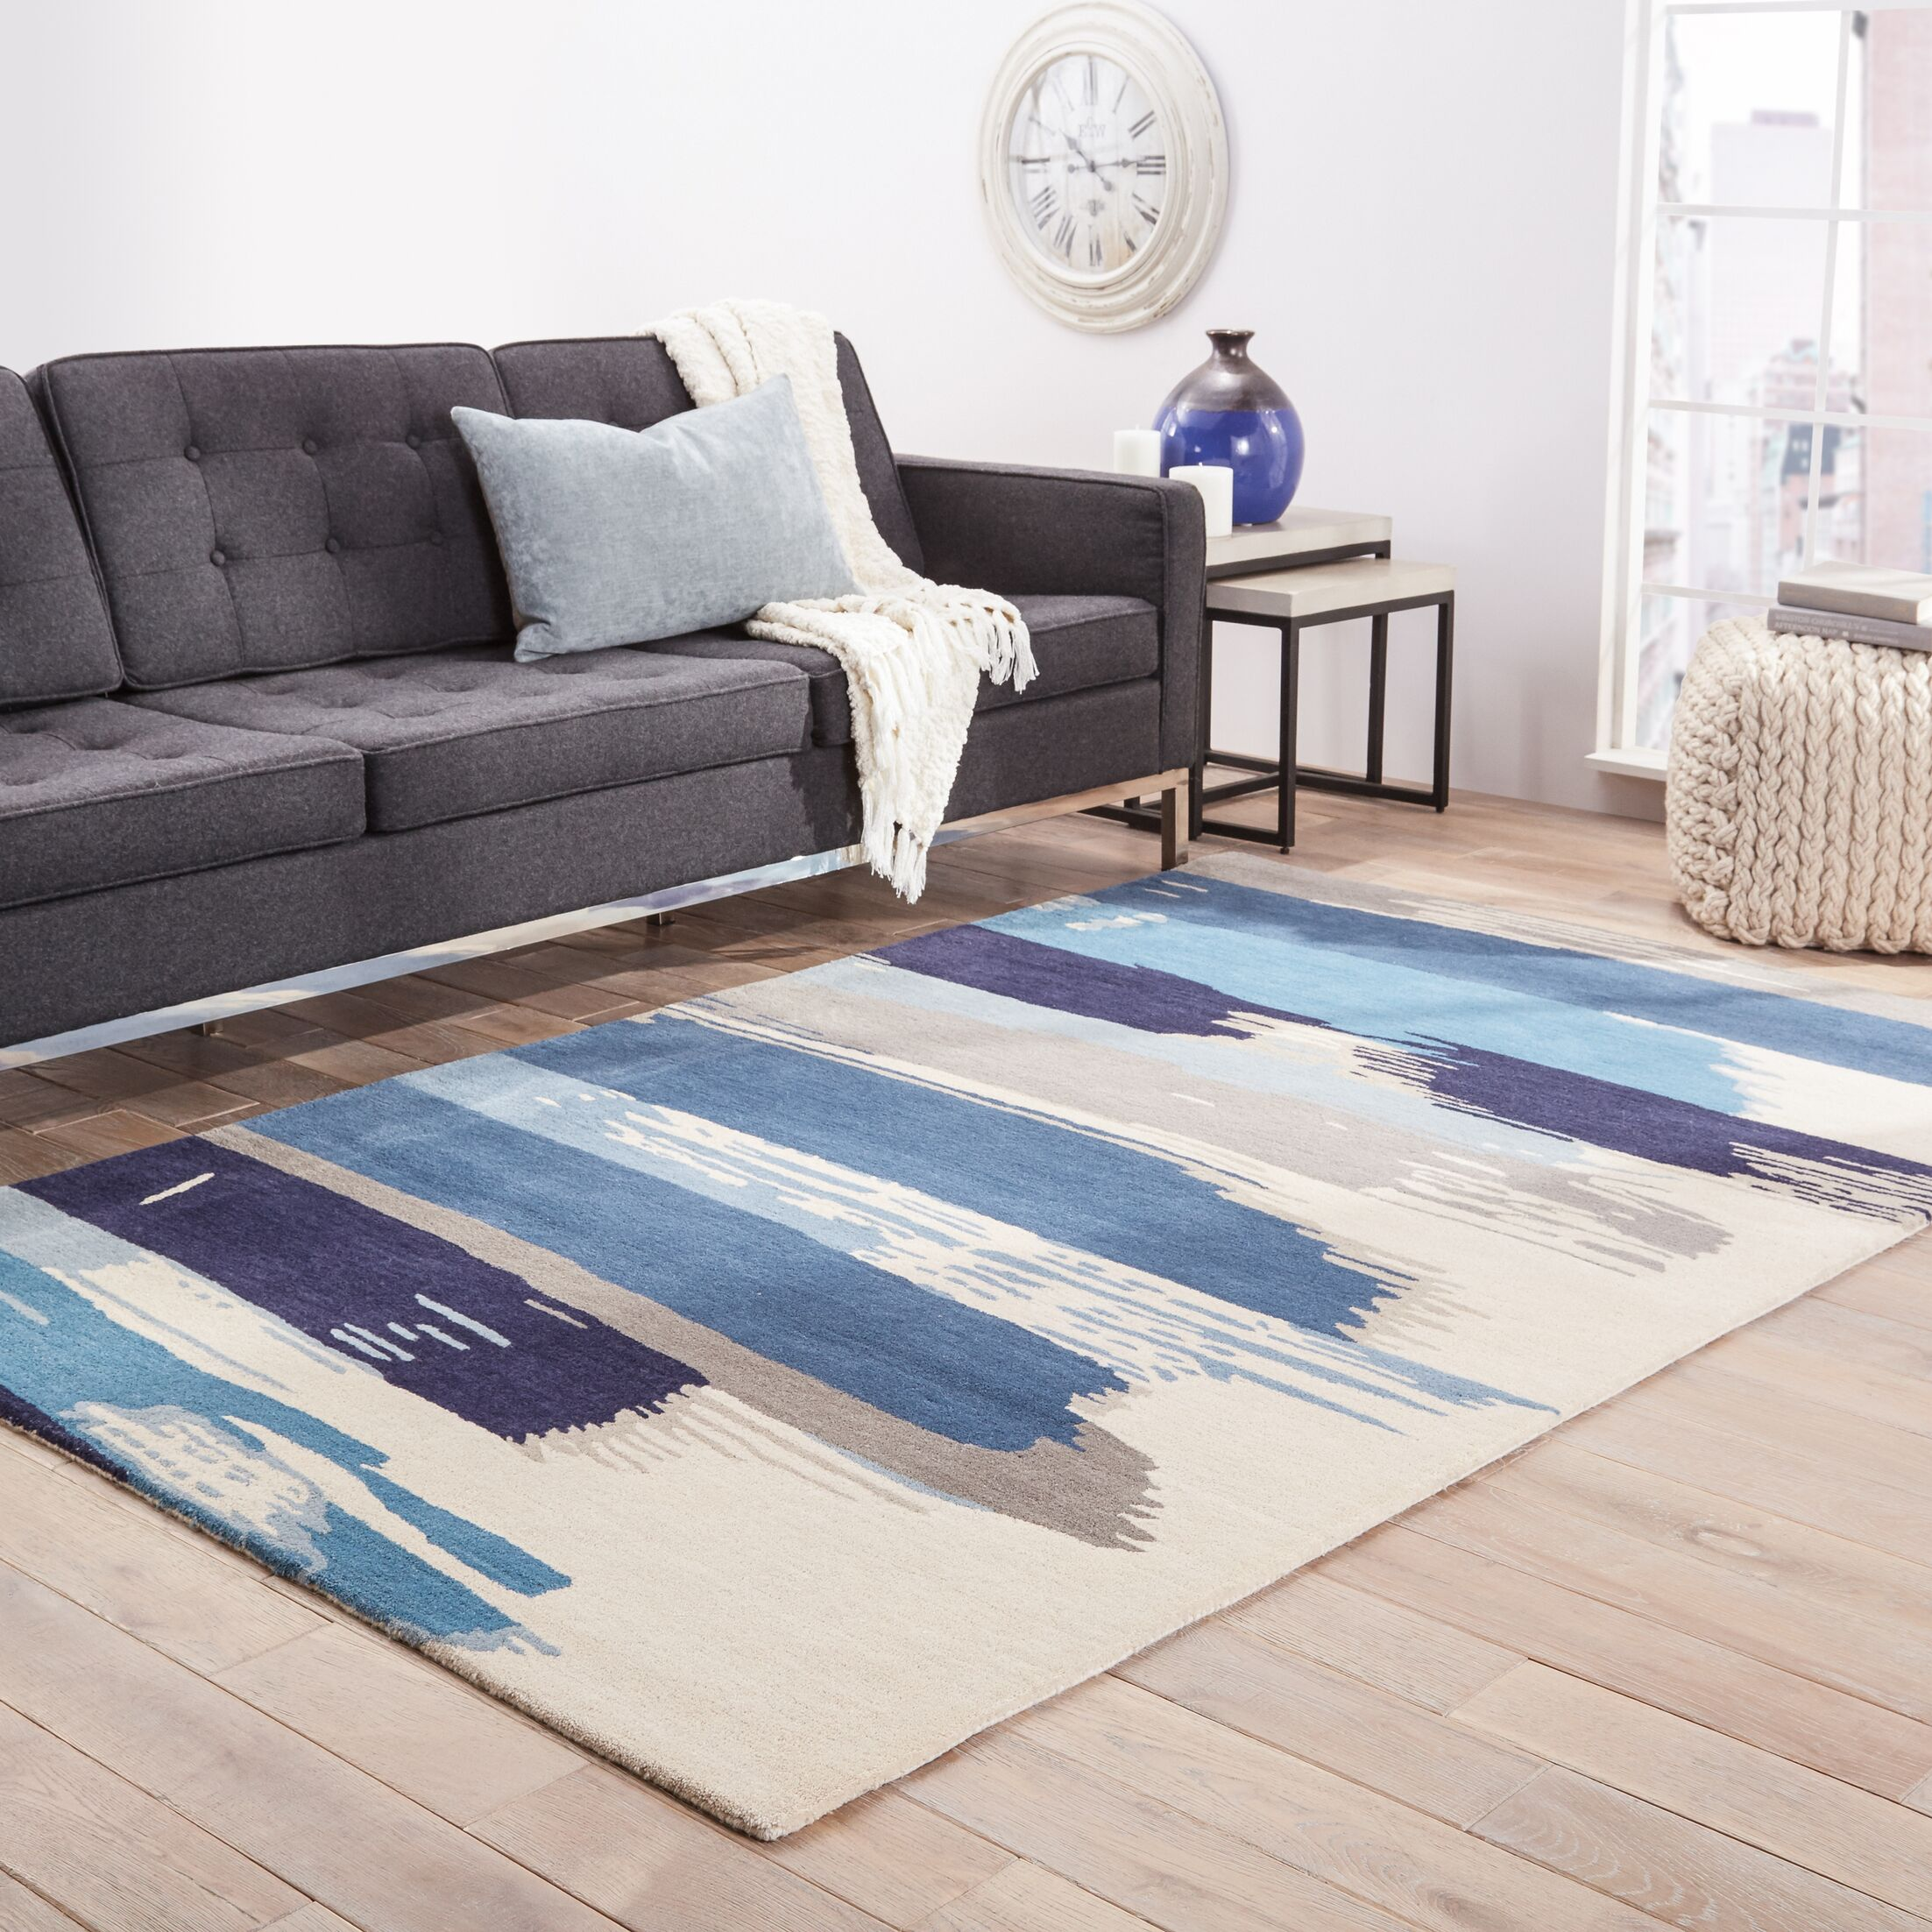 Nick Blue & Ivory Floral Area Rug Rug Size: Rectangle 8' x 11'